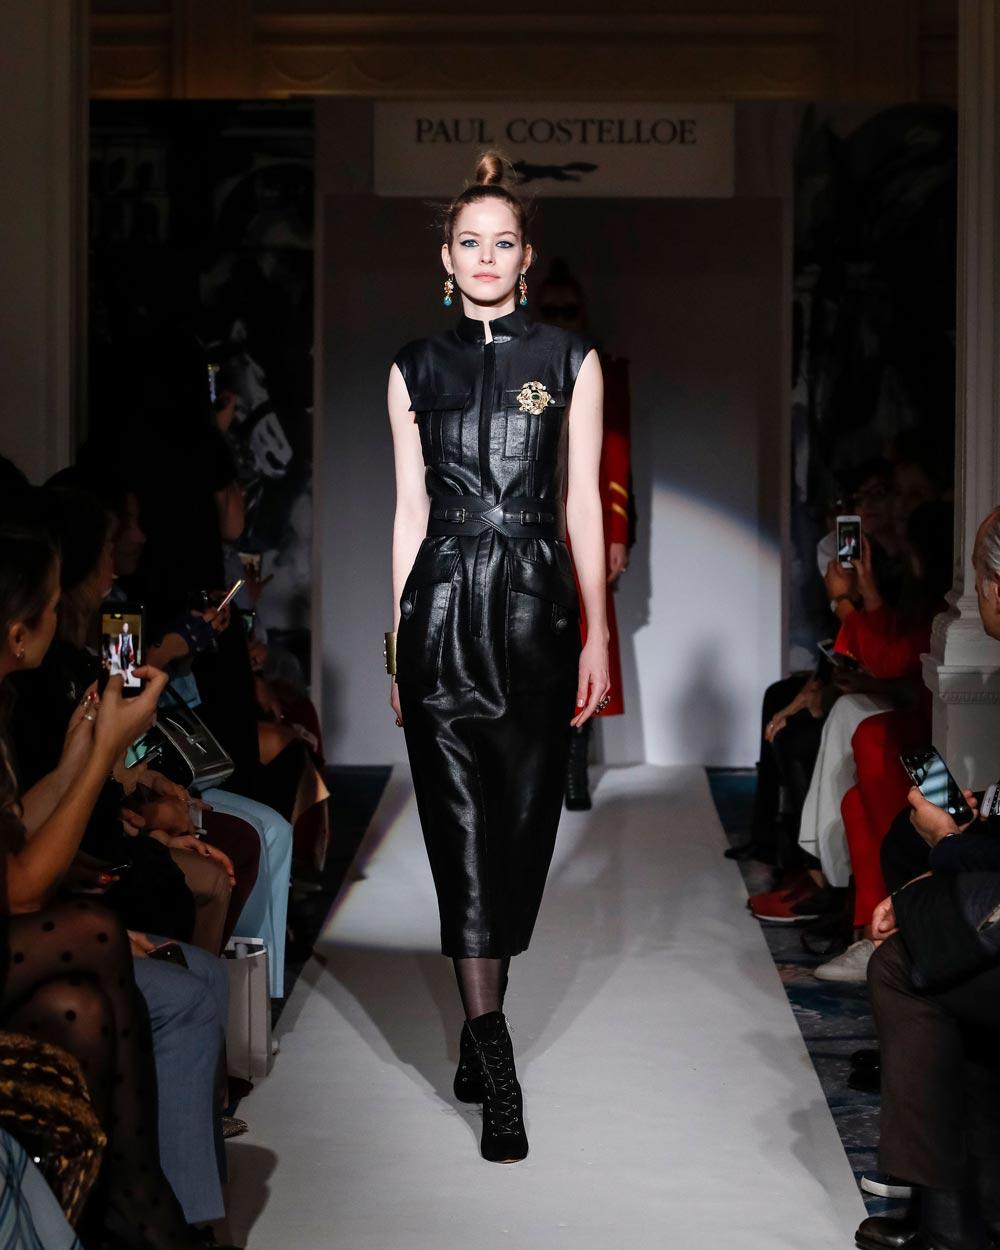 Paul Costelloe AW19 London Fashion Week on The Adelaidian